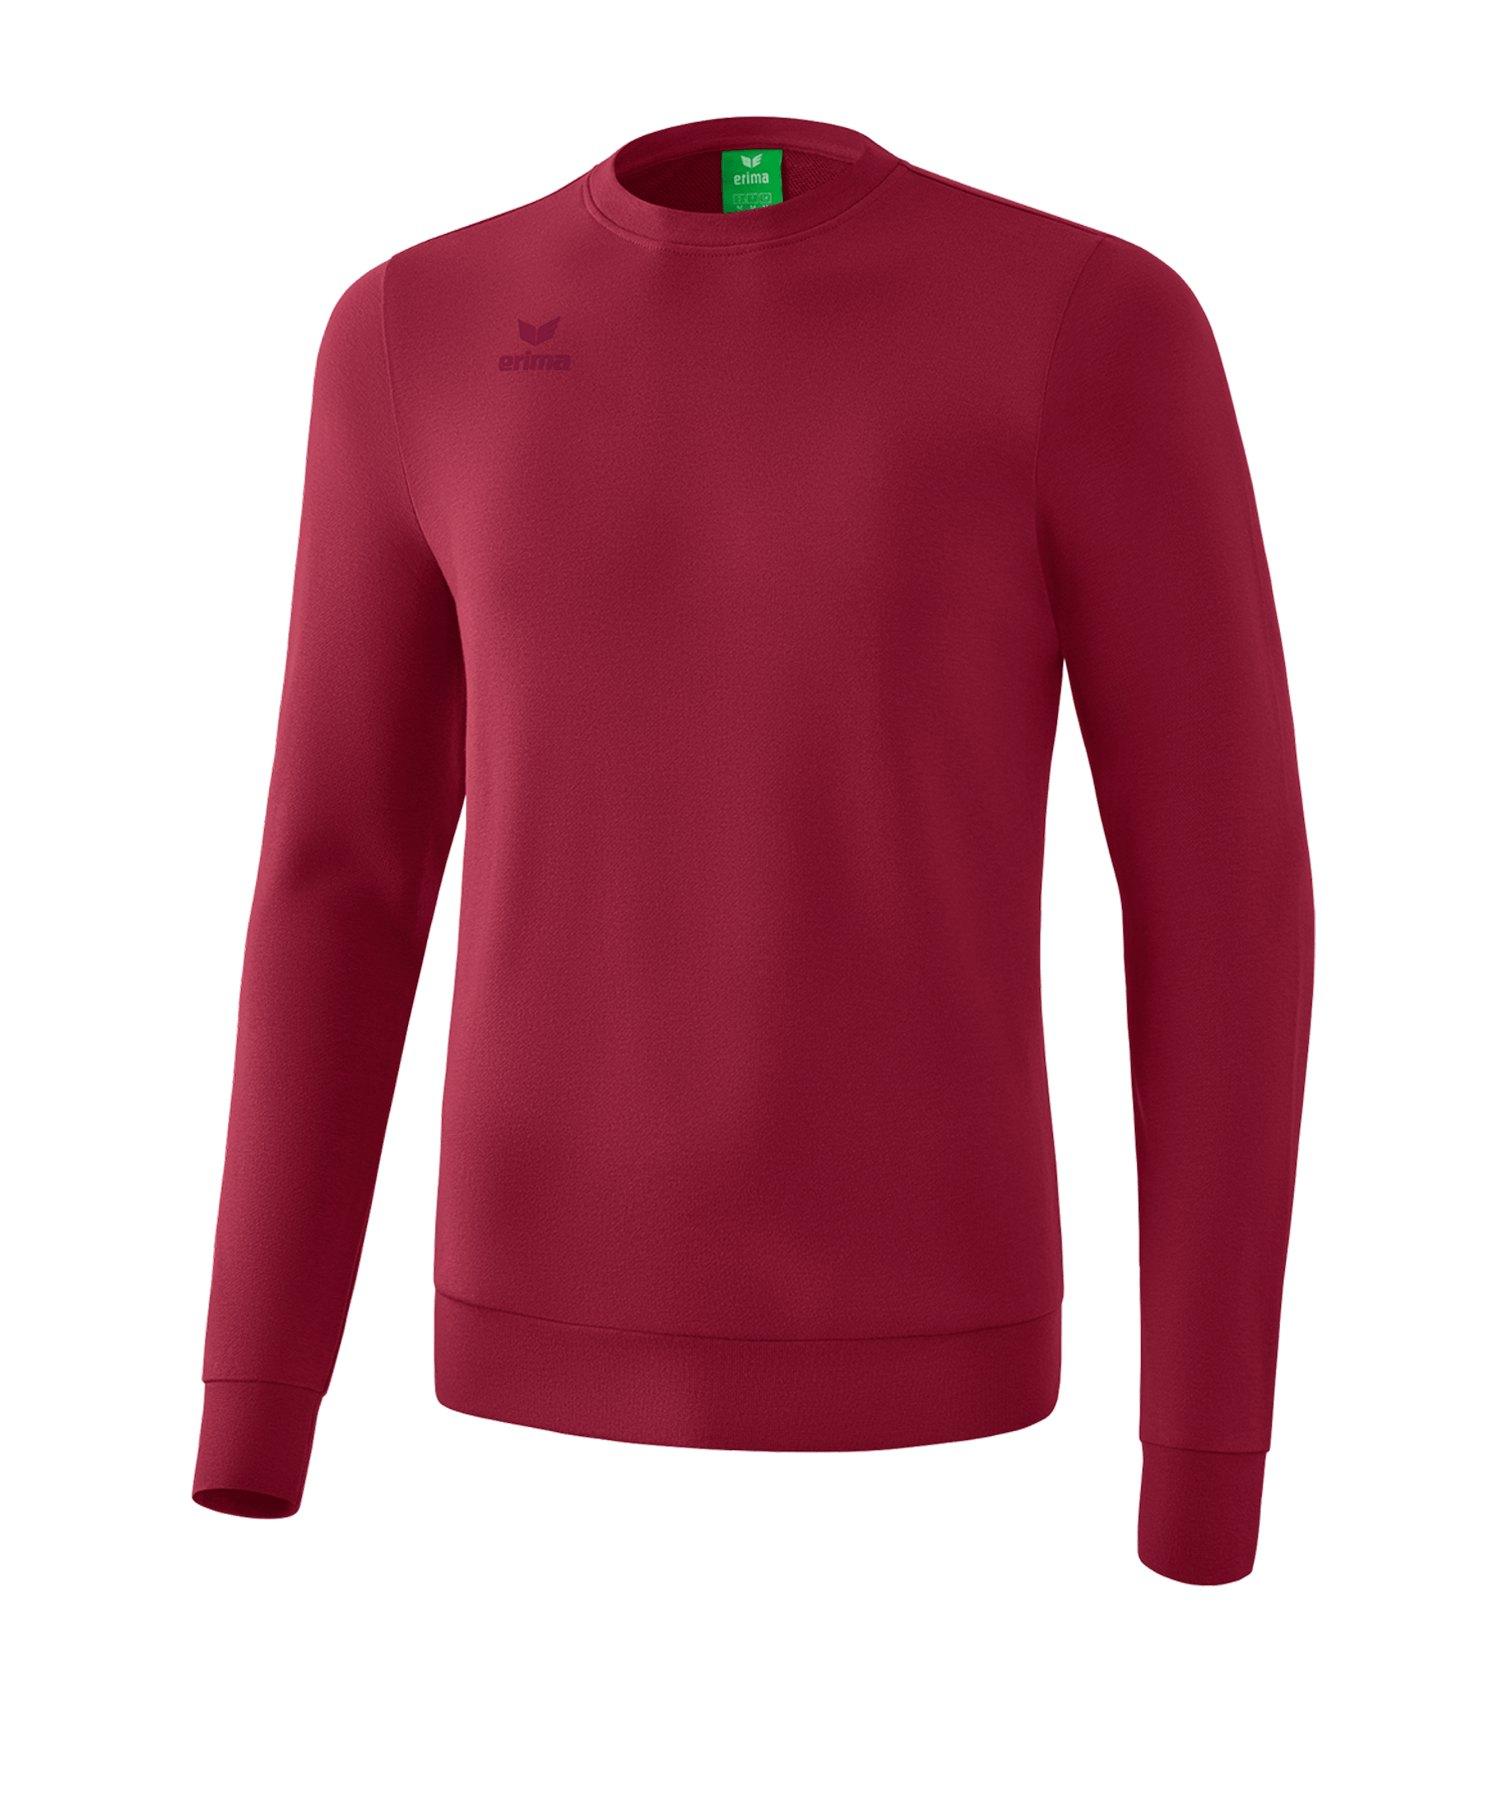 Erima Basic Sweatshirt Kids Dunkelrot - dunkelrot